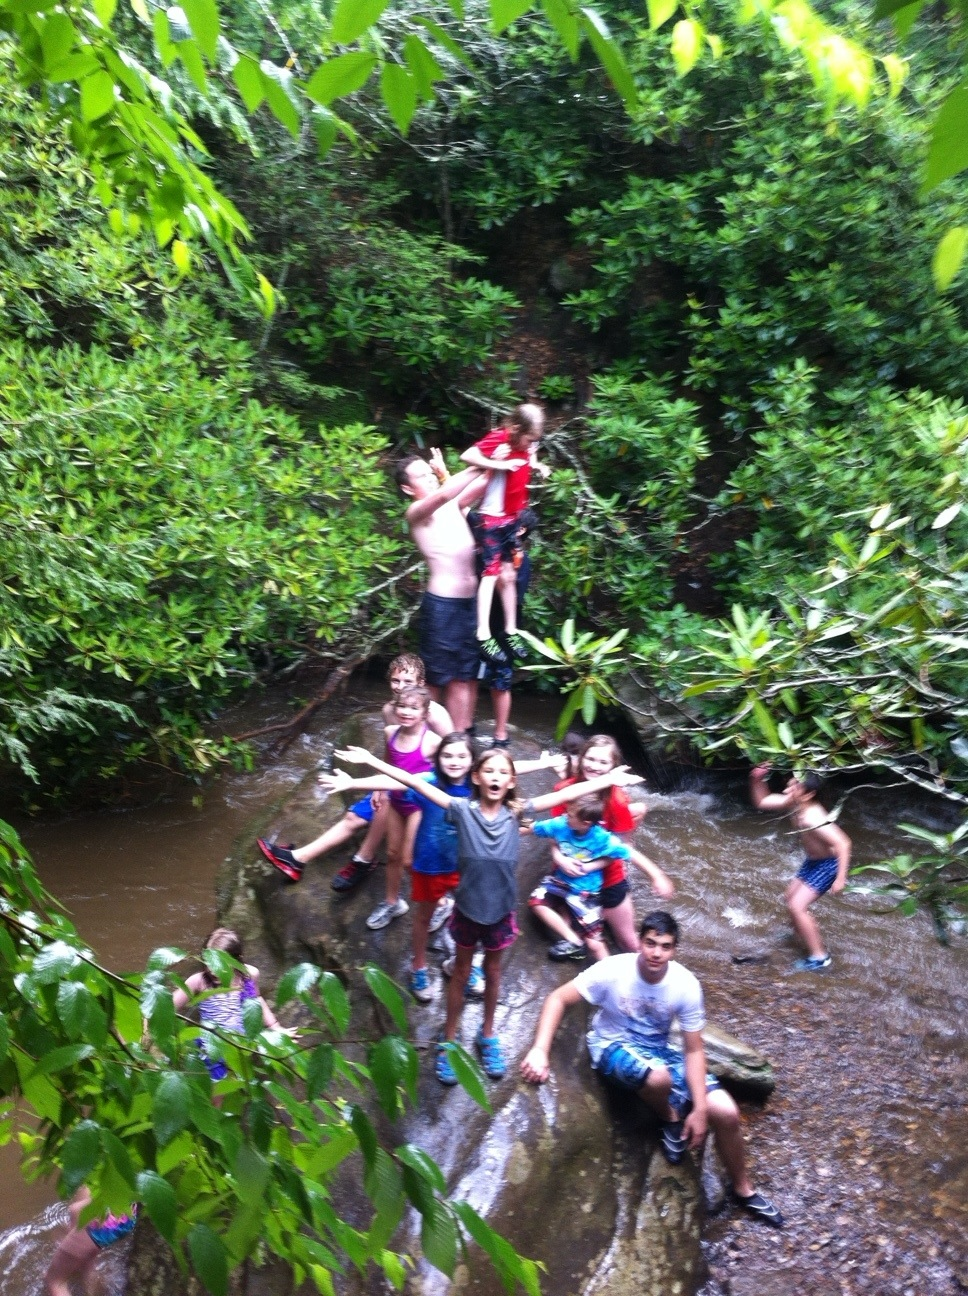 Big group of kids on the big rock